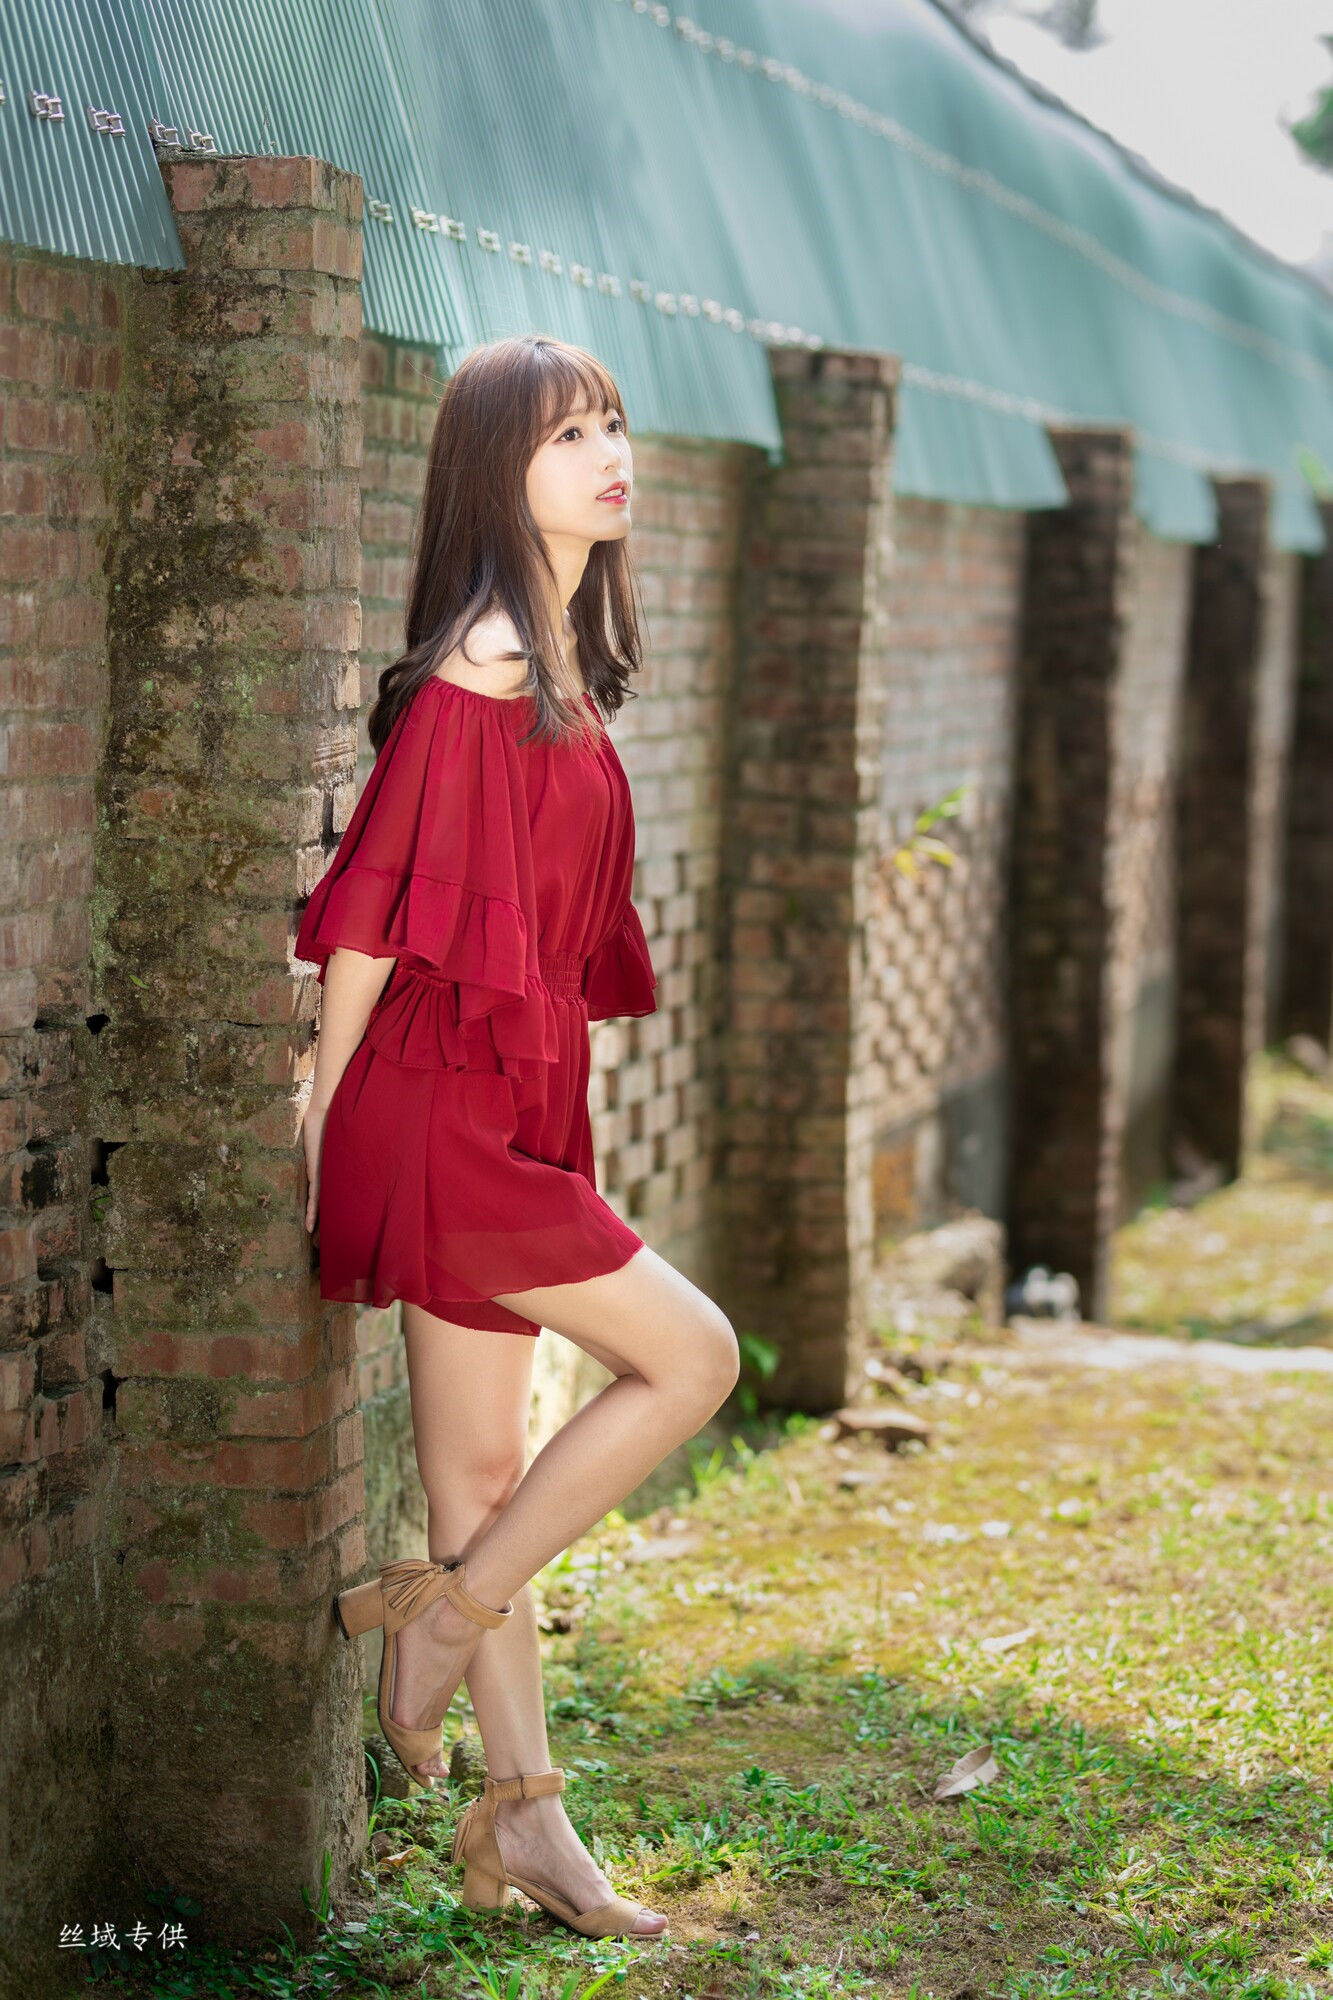 VOL.464 [台湾正妹]清新唯美正妹软妹:彭丽嘉(Lady憶憶)超高清个人性感漂亮大图(64P)